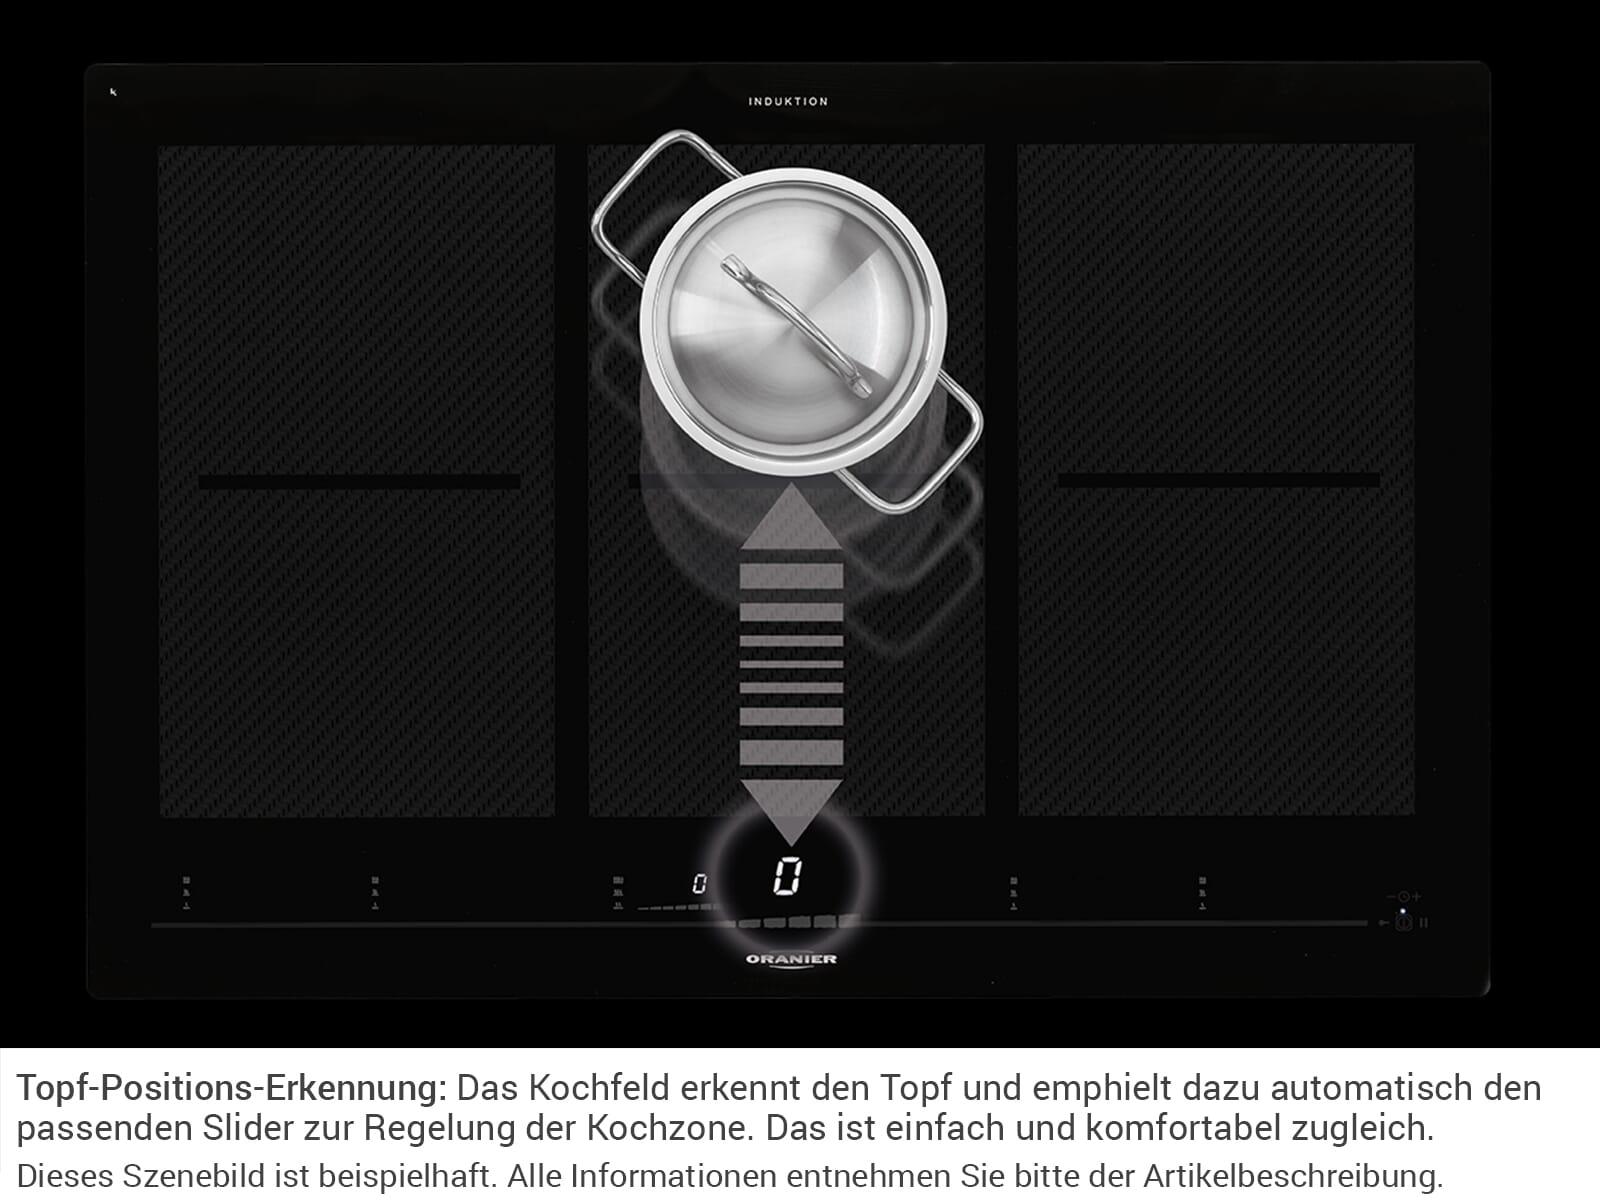 Oranier FLI 2038 be-cook - 2038 12 Domino Induktionskochfeld autark